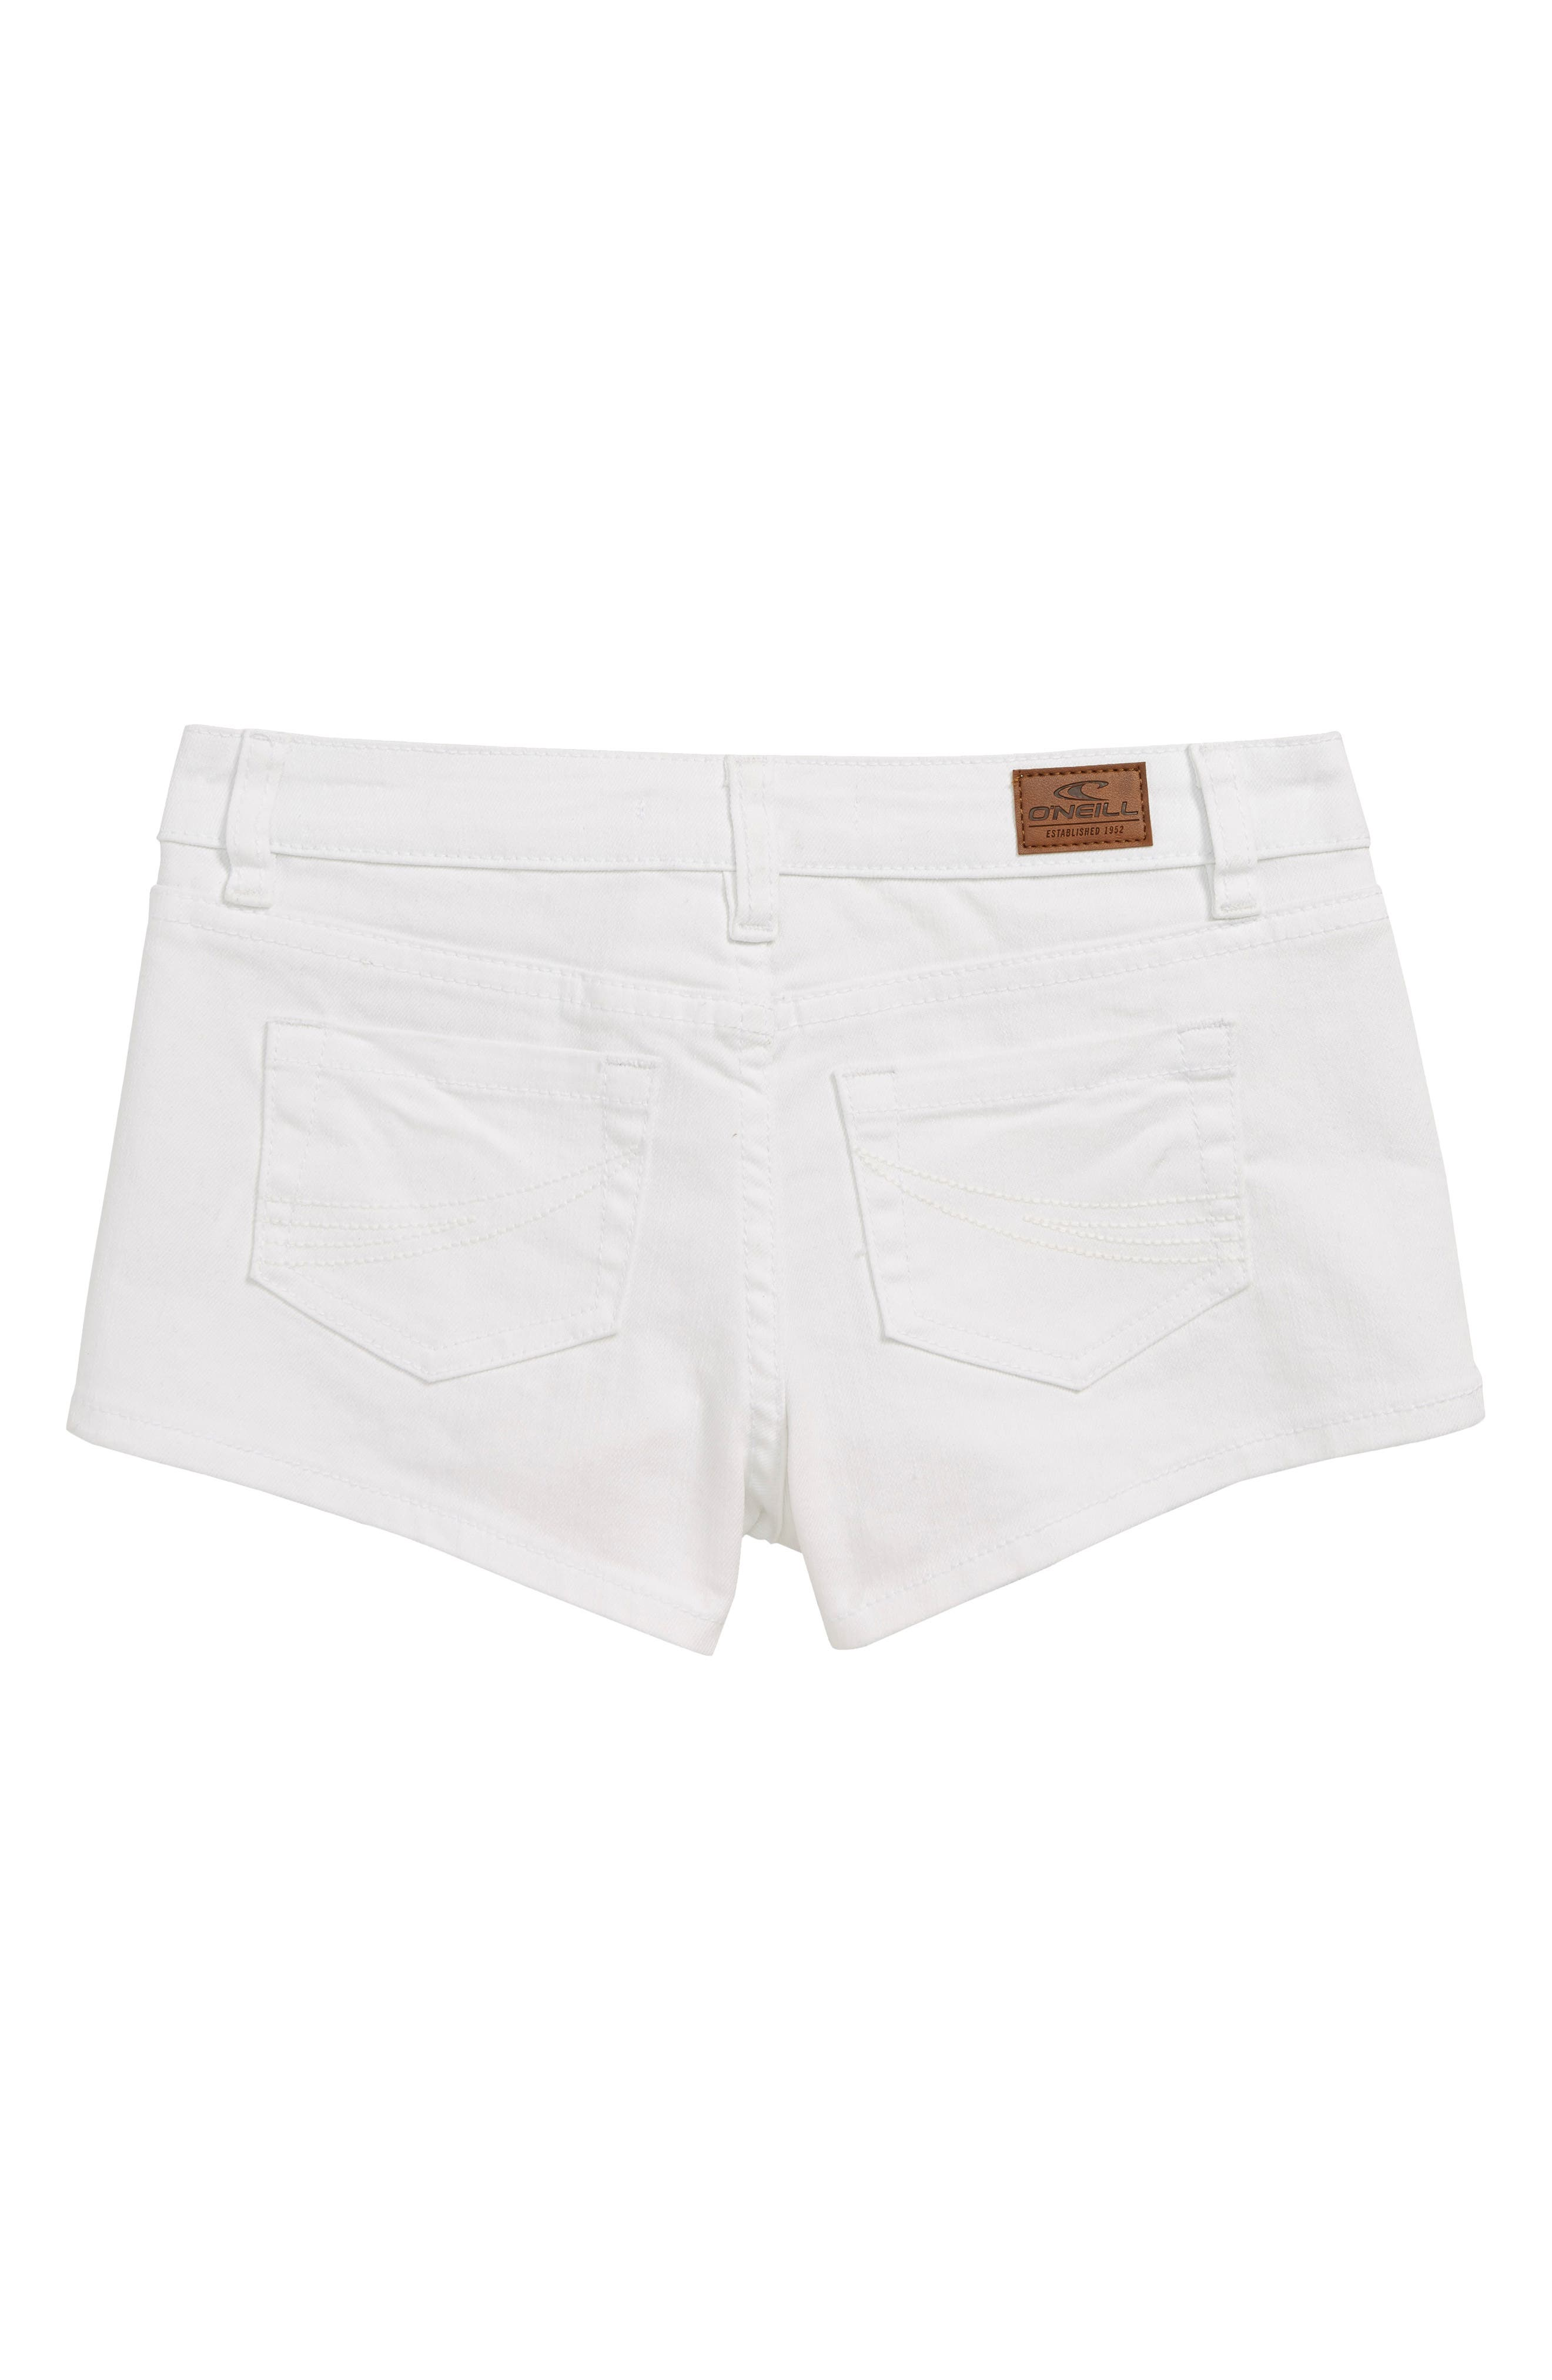 O'NEILL, Waidly Denim Shorts, Alternate thumbnail 2, color, WHITE